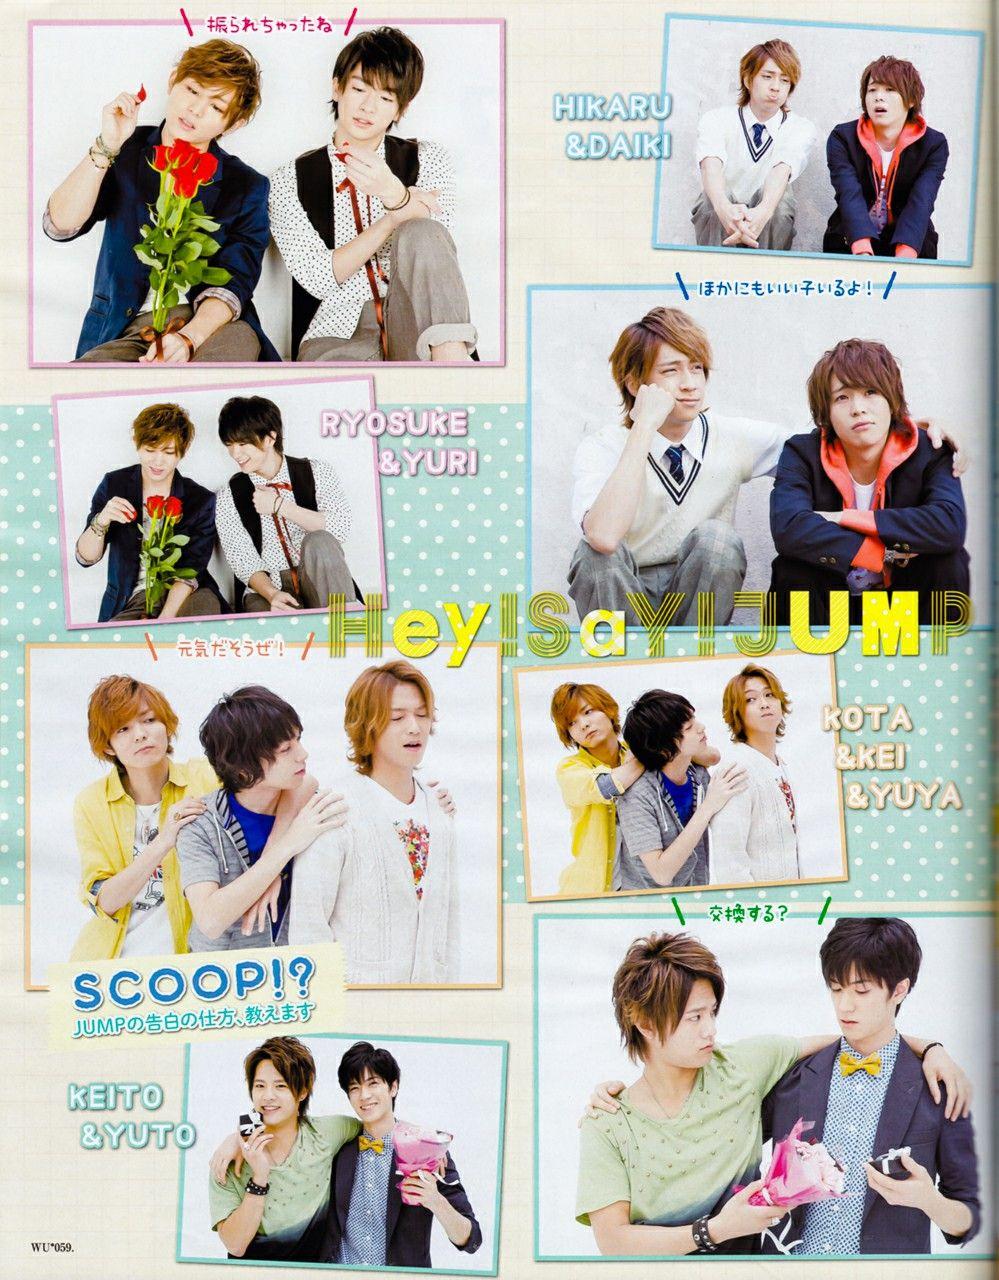 WINK UP 2013.07 - 01【2020】 | 岡本圭人, 中島裕翔, 高木雄也